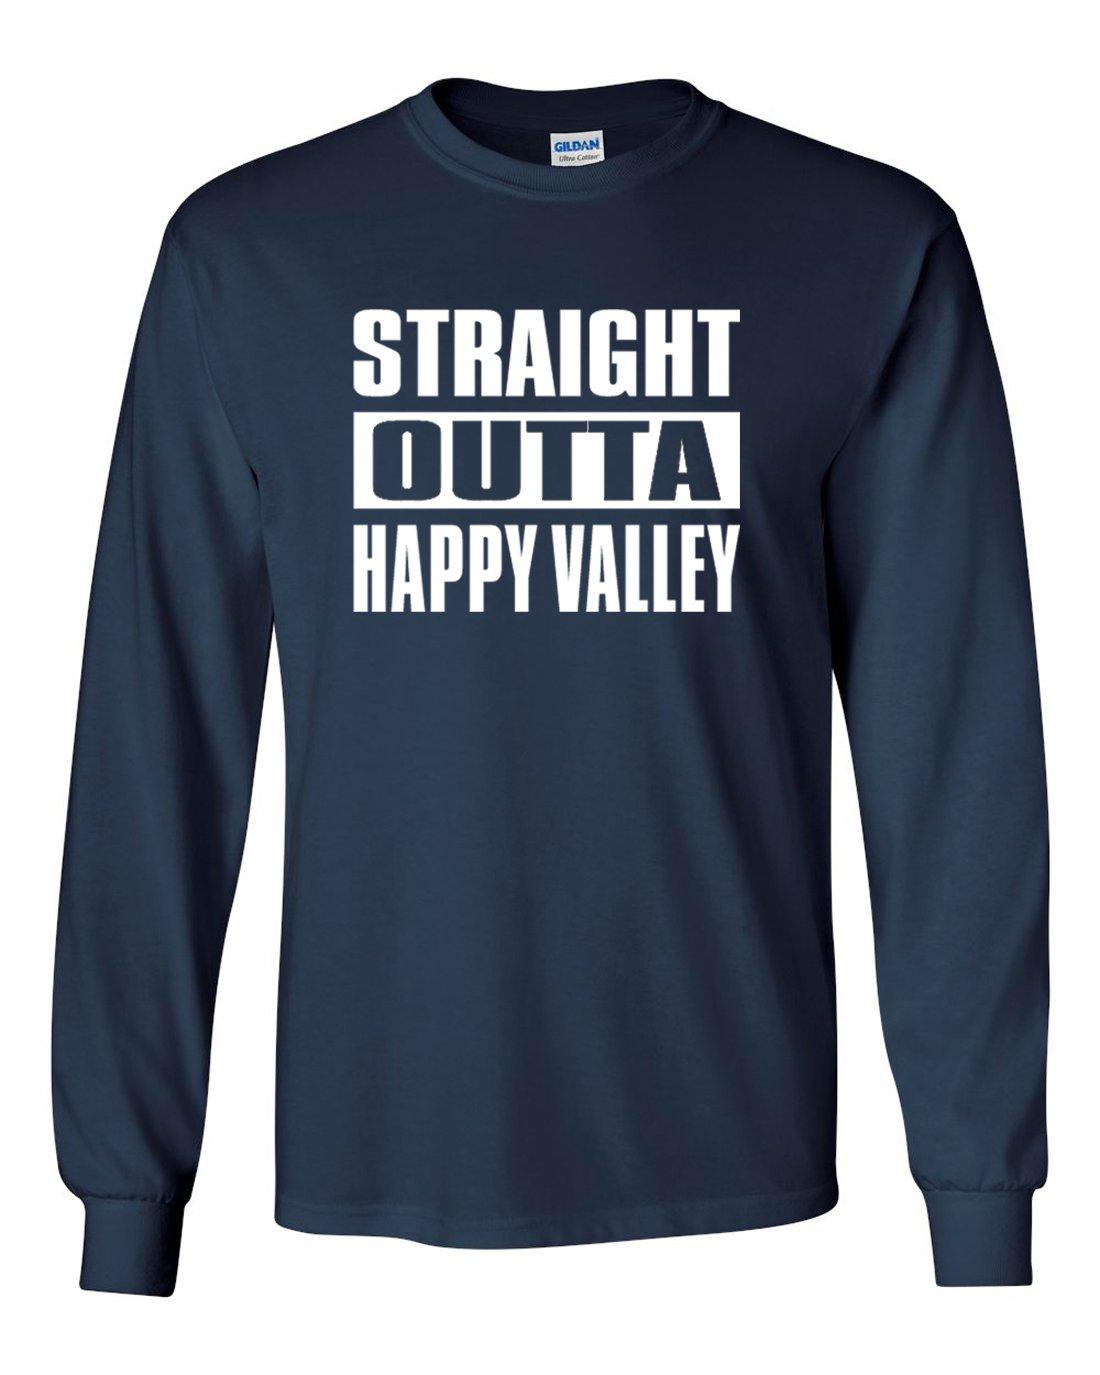 Silo 長袖ネイビーペンシルバニア「Straight Outta Happy Valley」Tシャツ B07581FXJ3  Adult 4XL